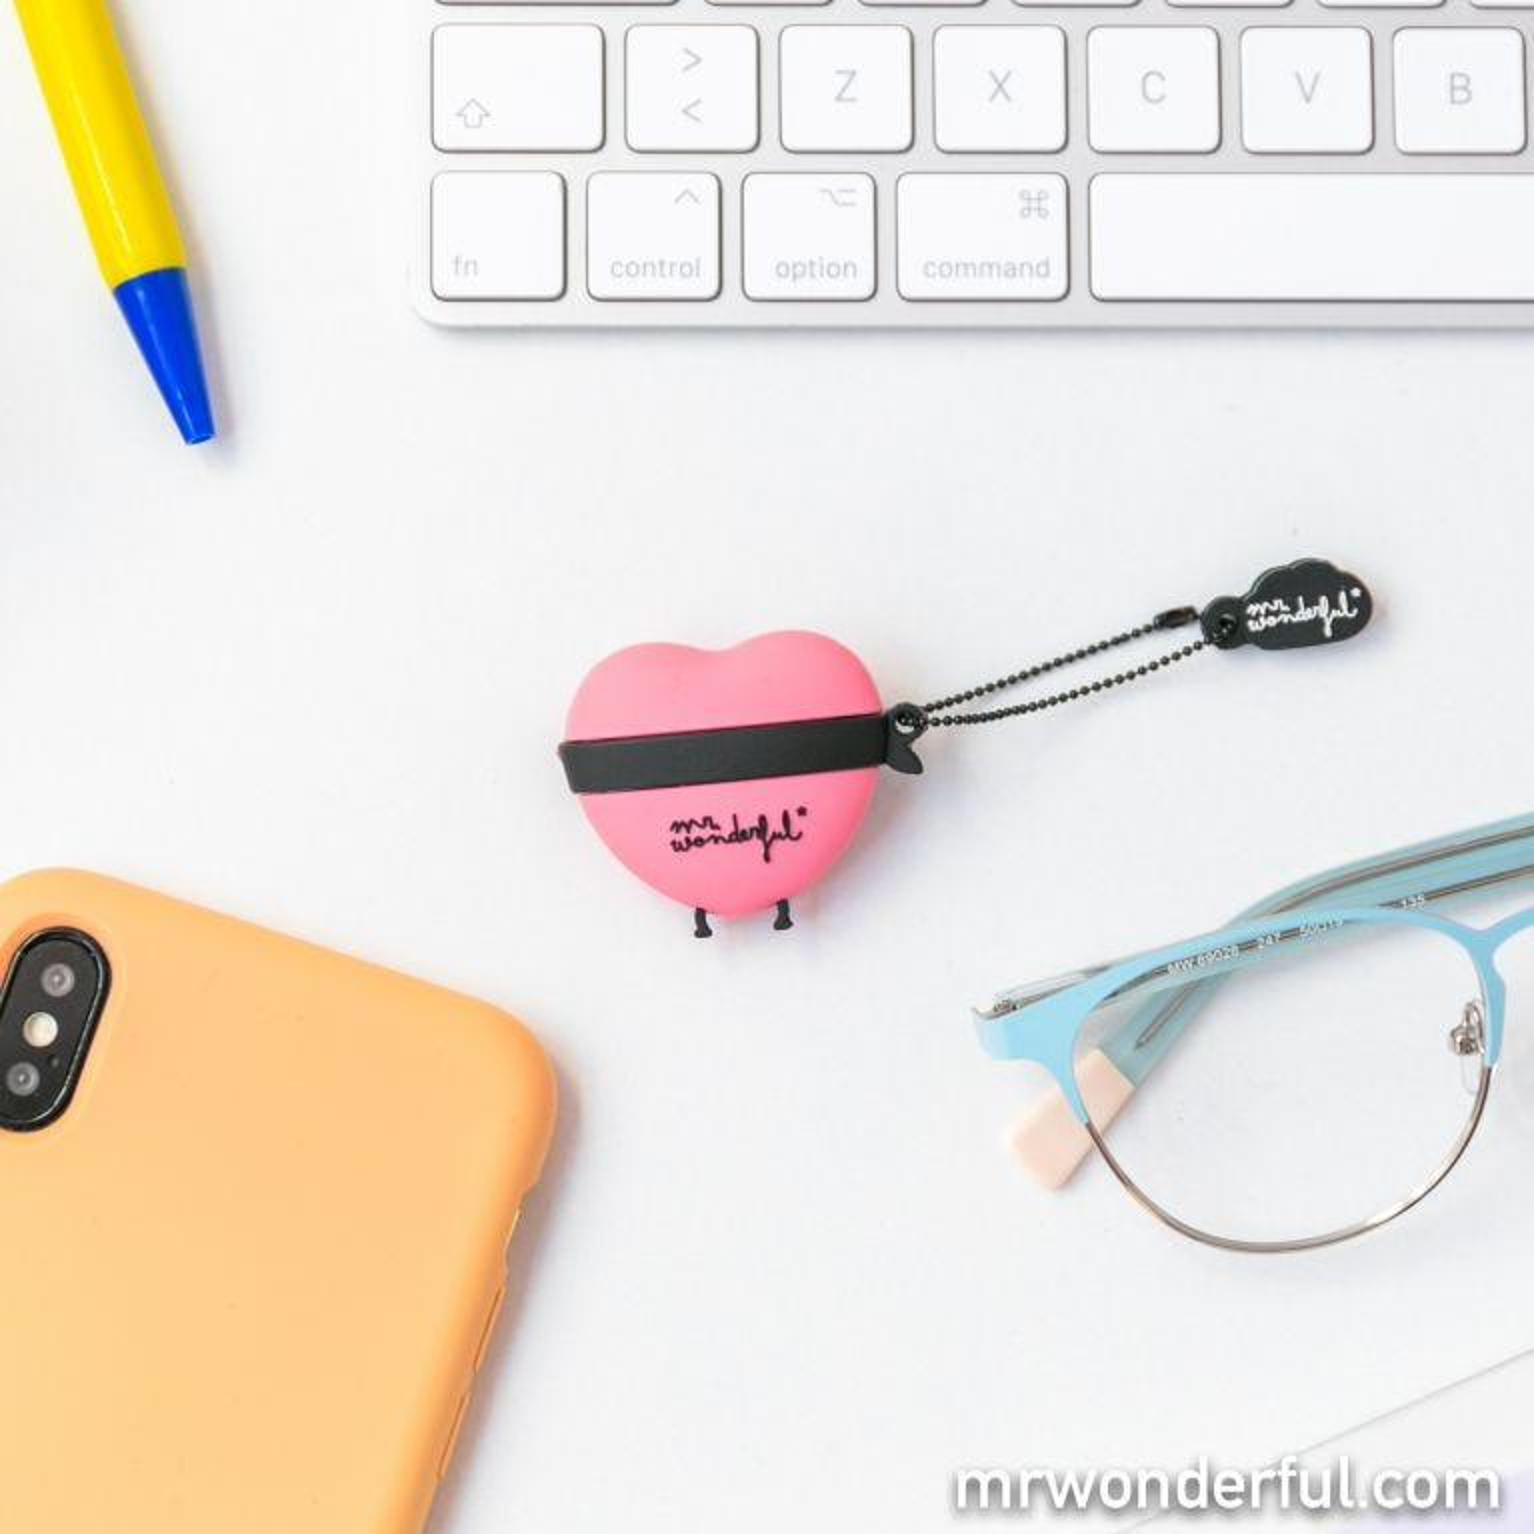 32 GB USB stick – Bandit heart